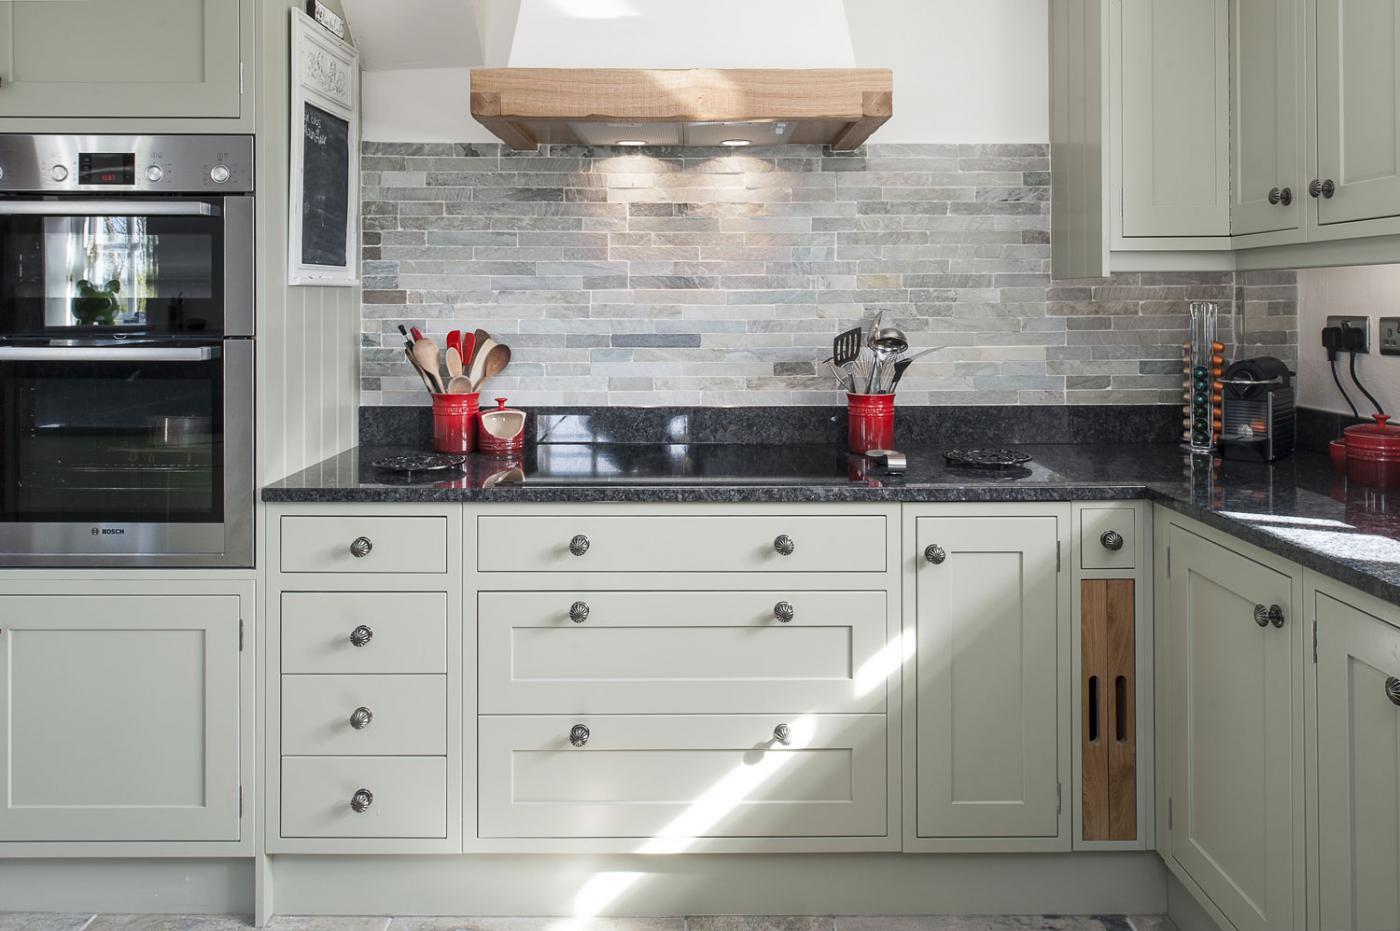 stone backsplash kitchen drapes 27 designs home dreamy